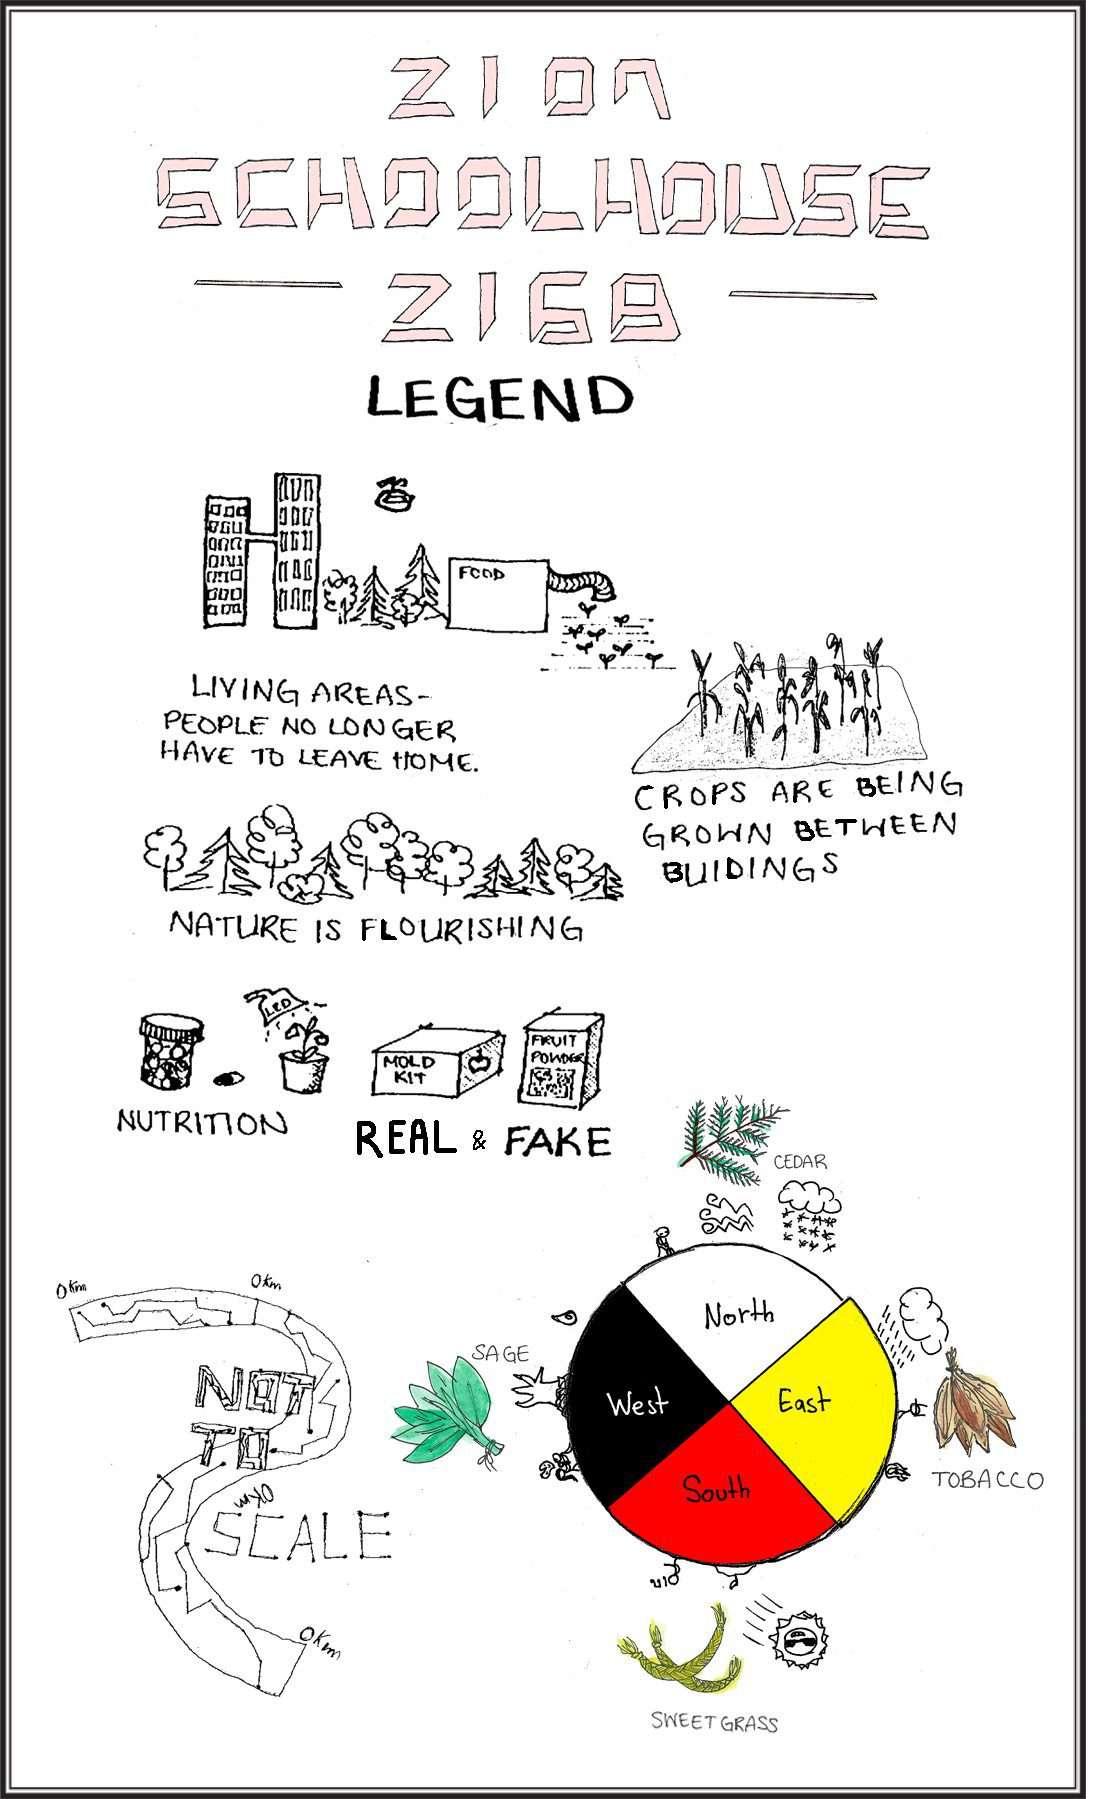 _Future legend